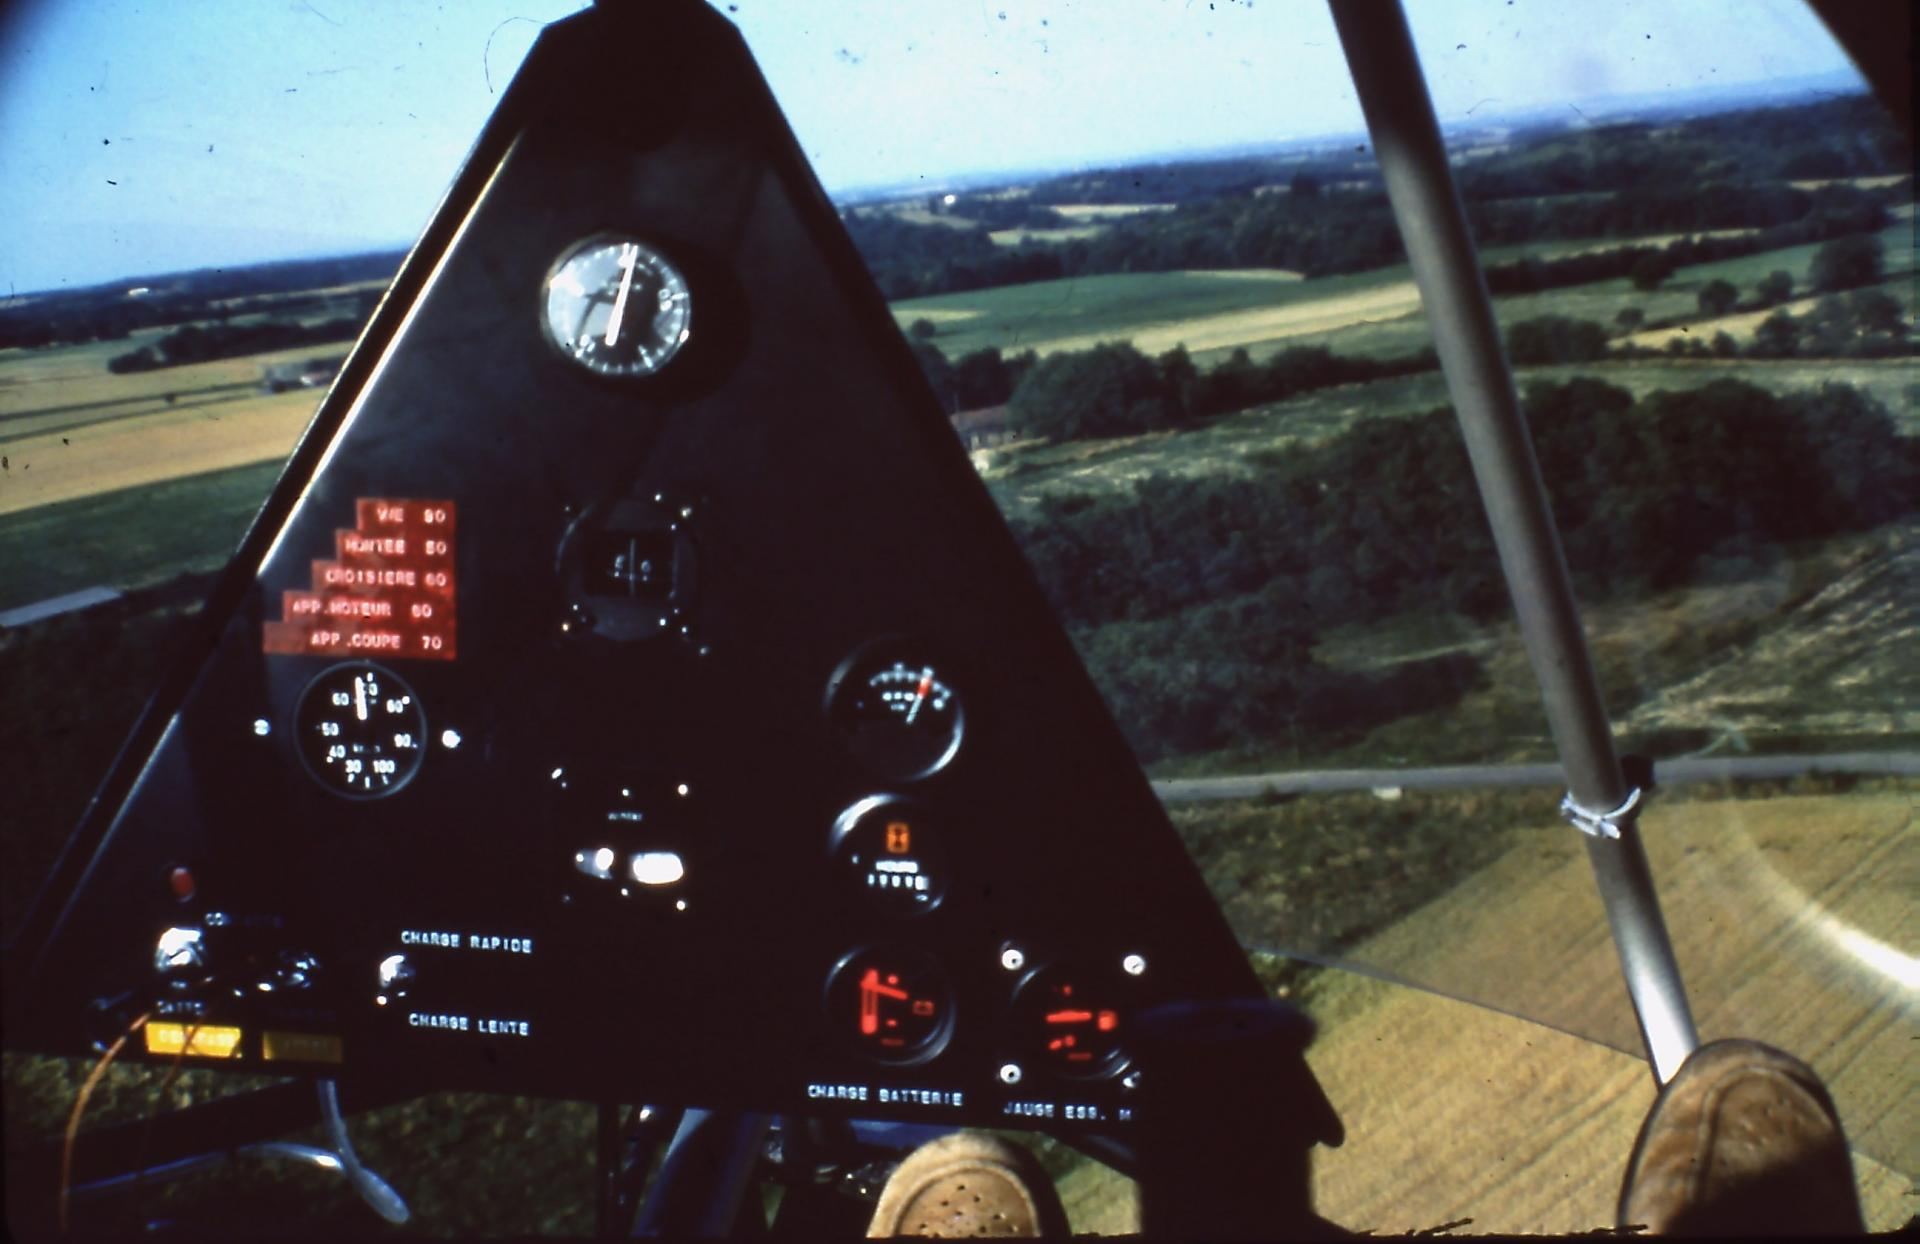 1983 avions 8 2